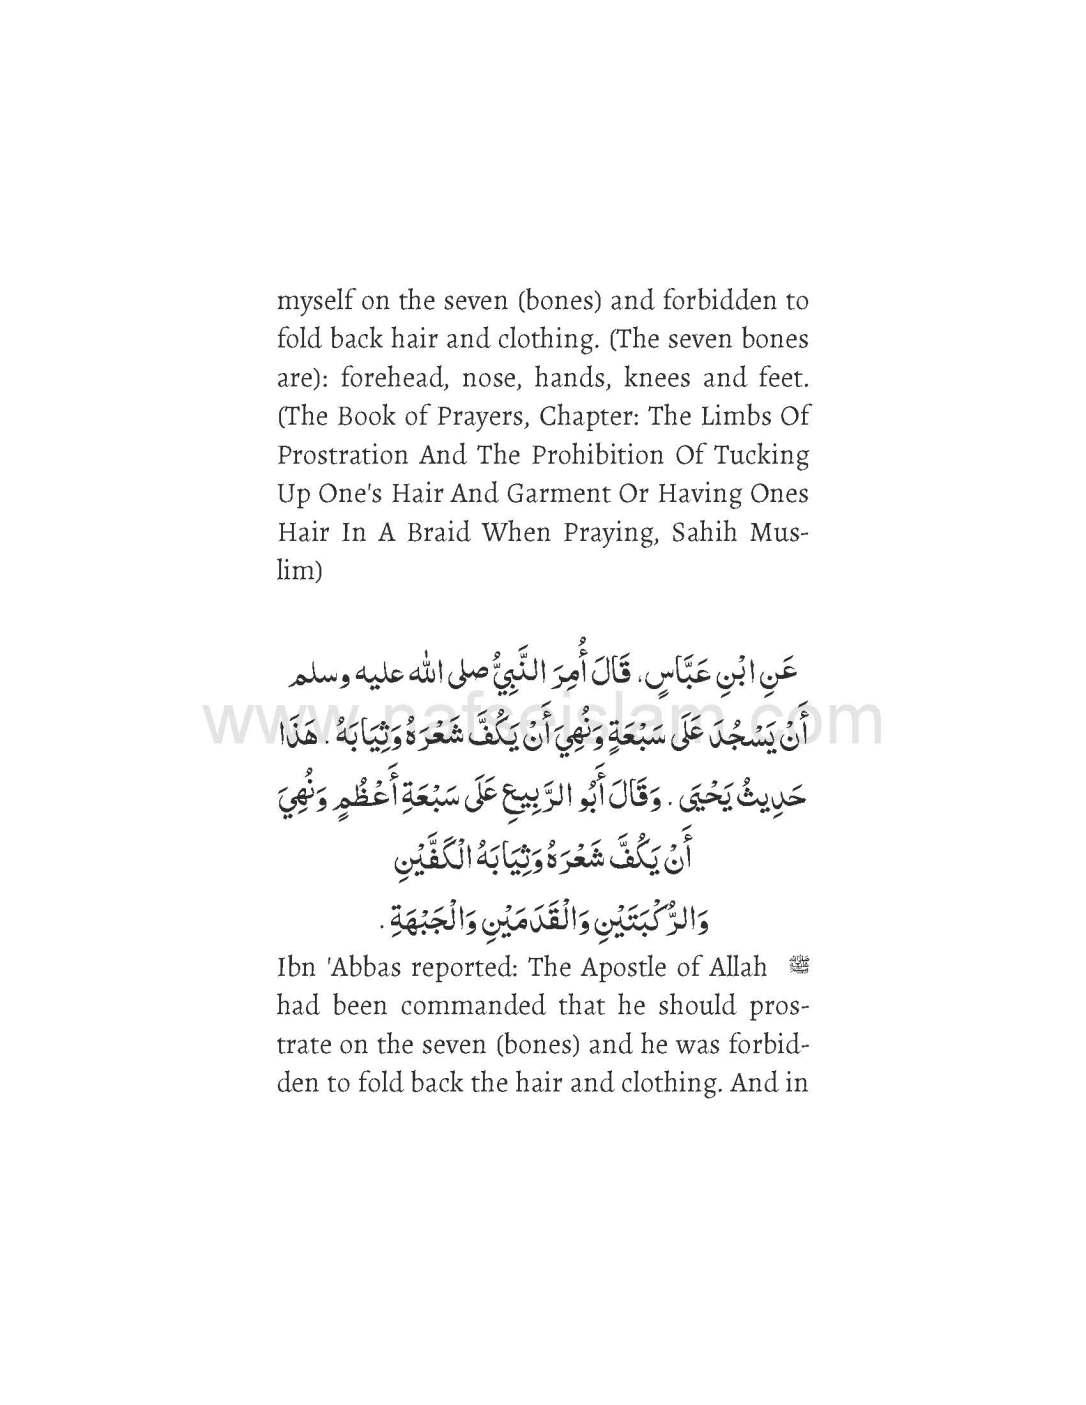 Islamic Ruling On Folding Pants In Salah_Page_10